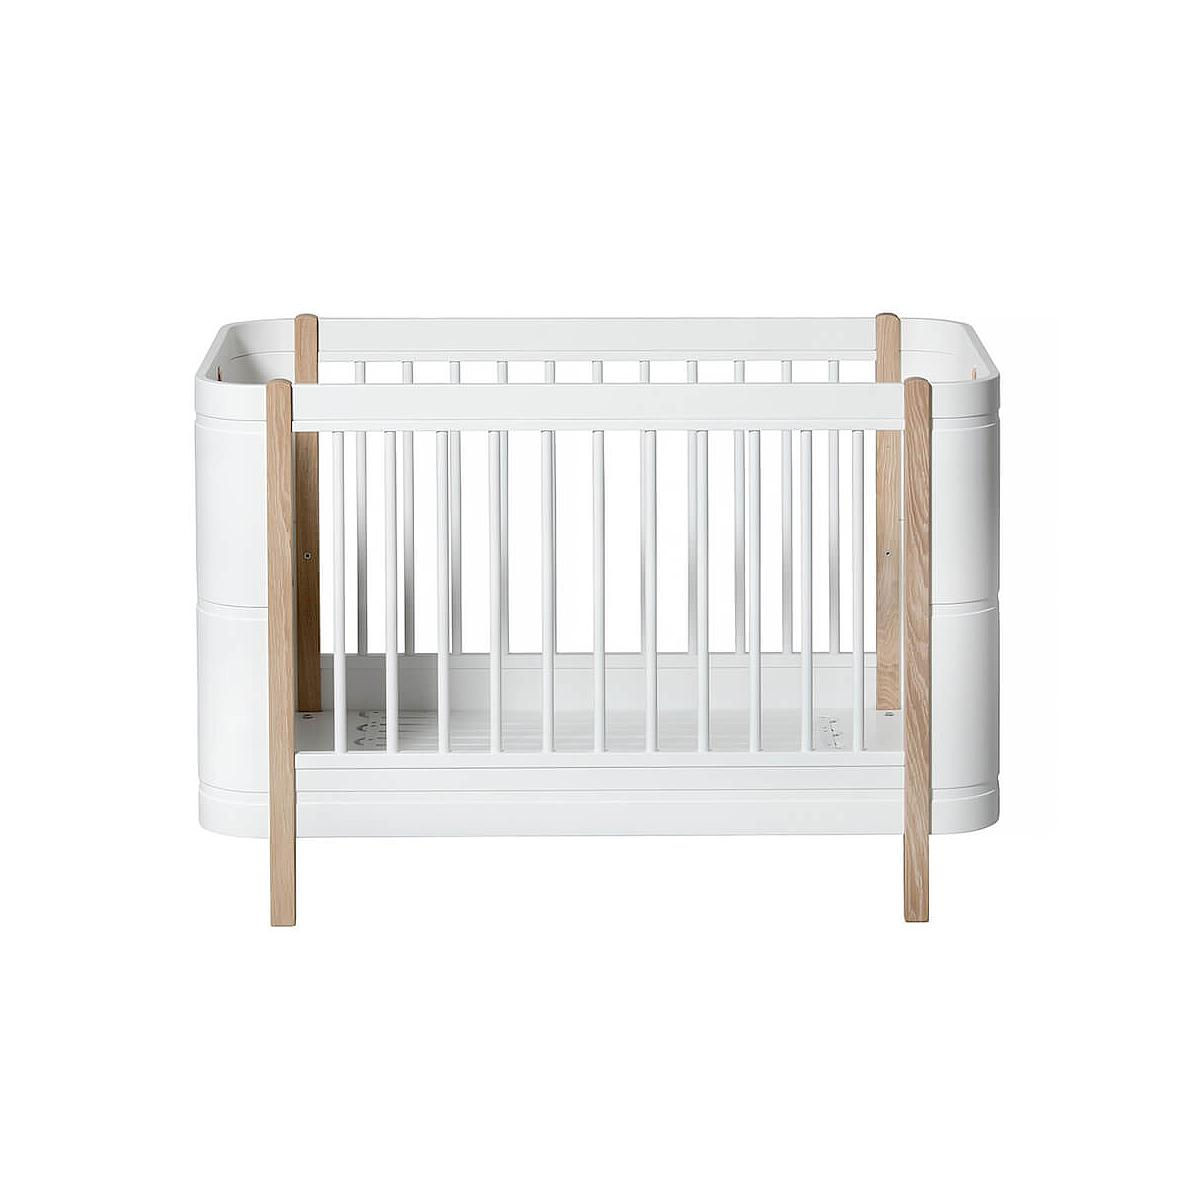 Lit bébé évolutif 68x122cm/162cm WOOD MINI+ Oliver Furniture blanc-chêne